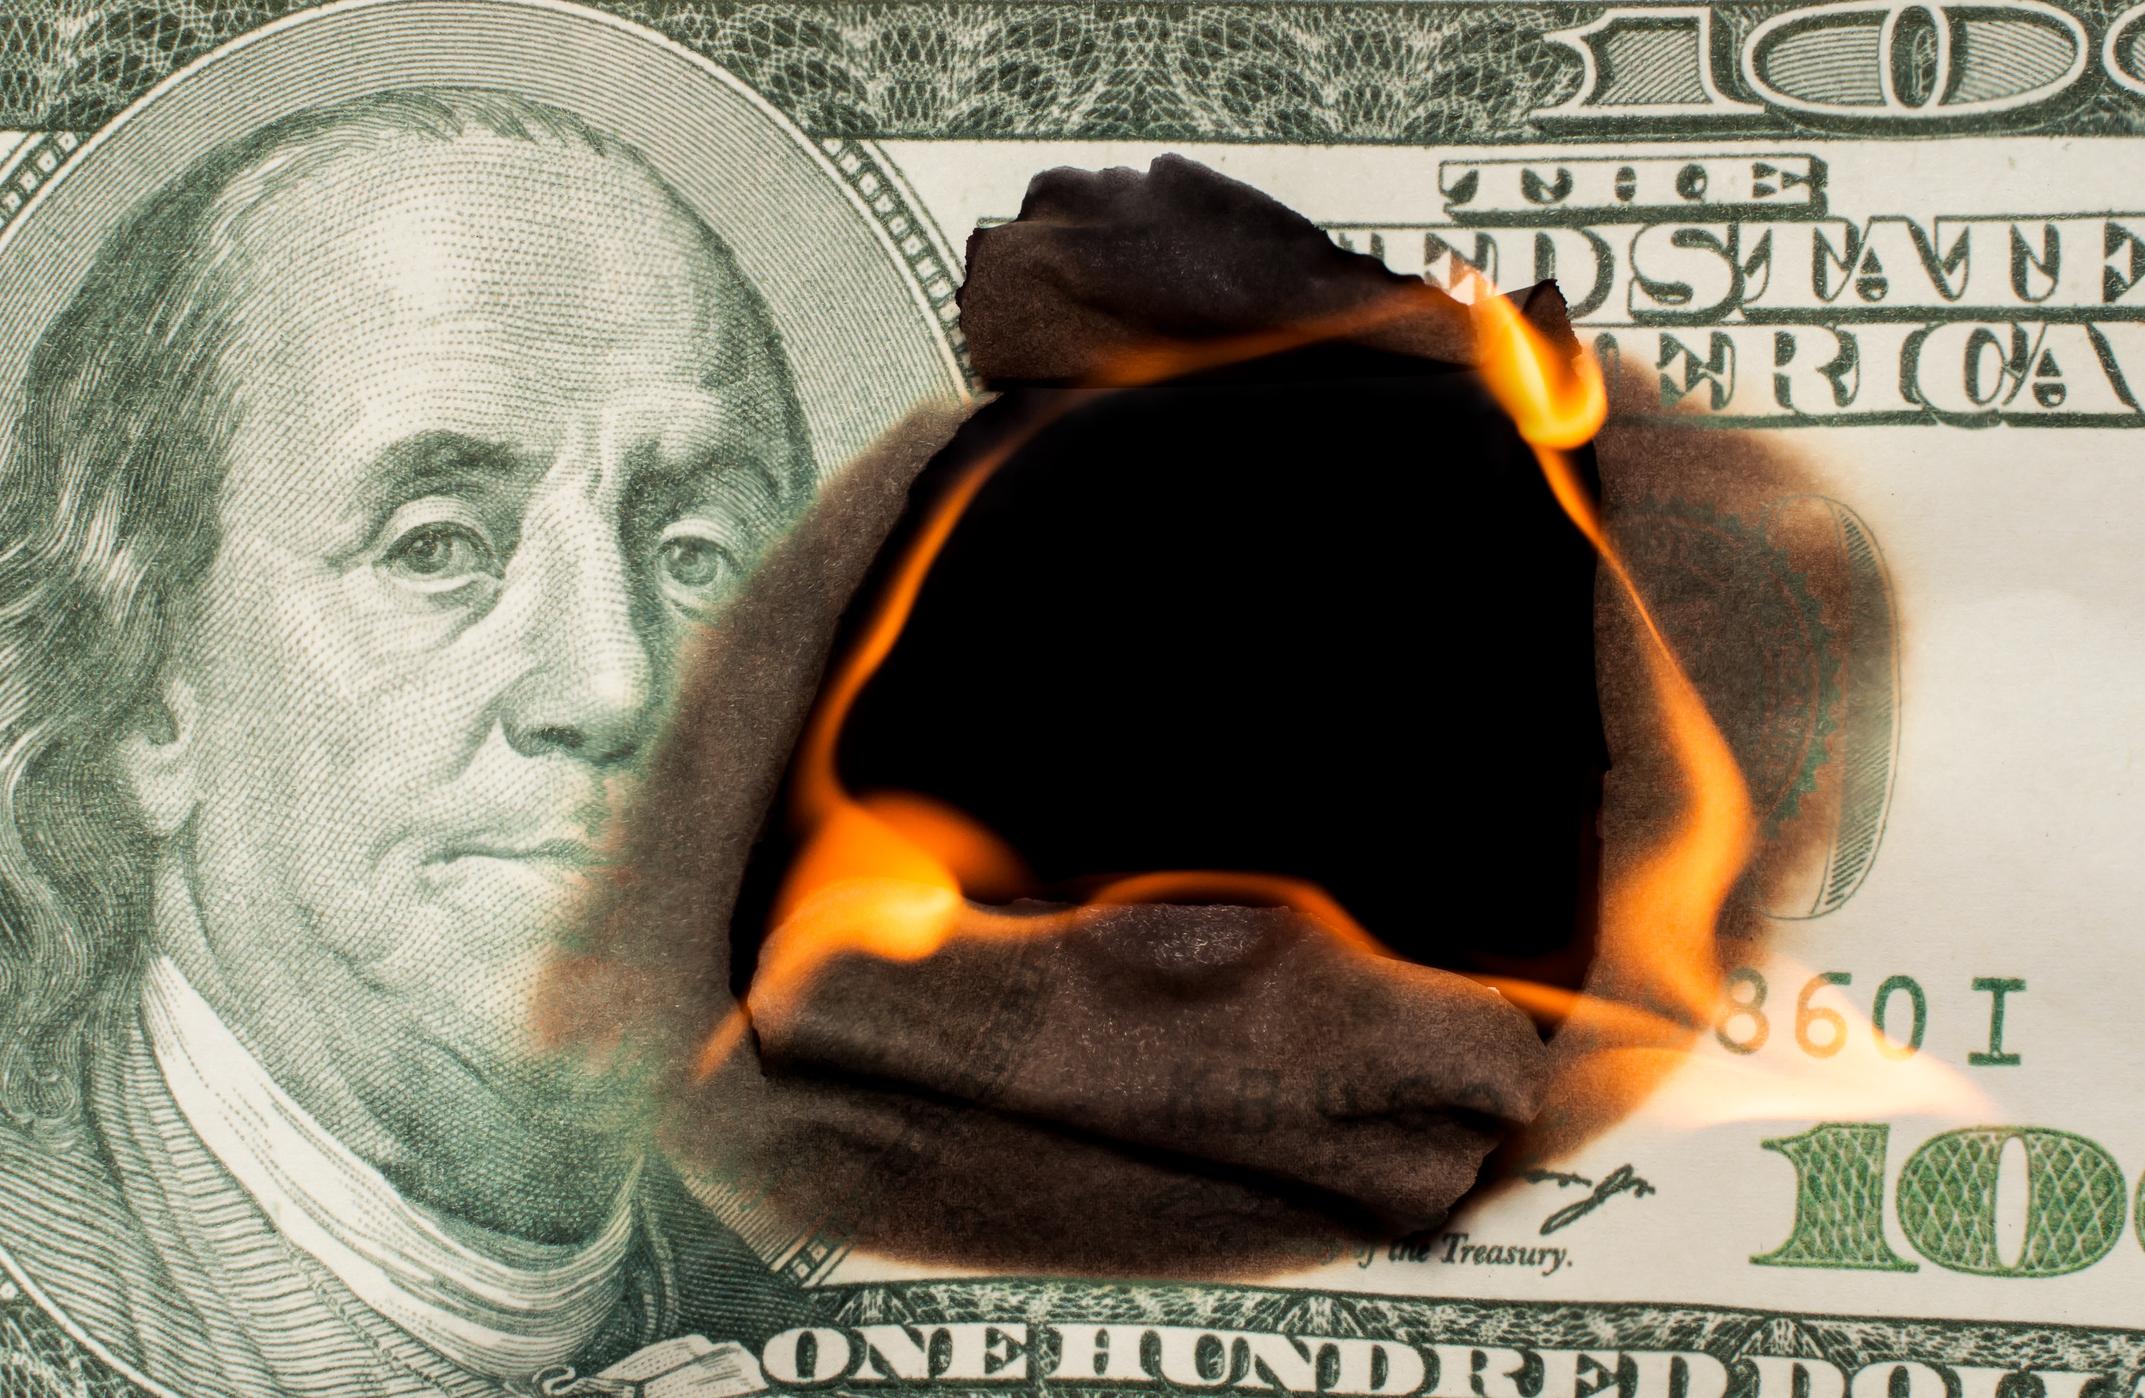 A hundred-dollar bill burning outward from the center.